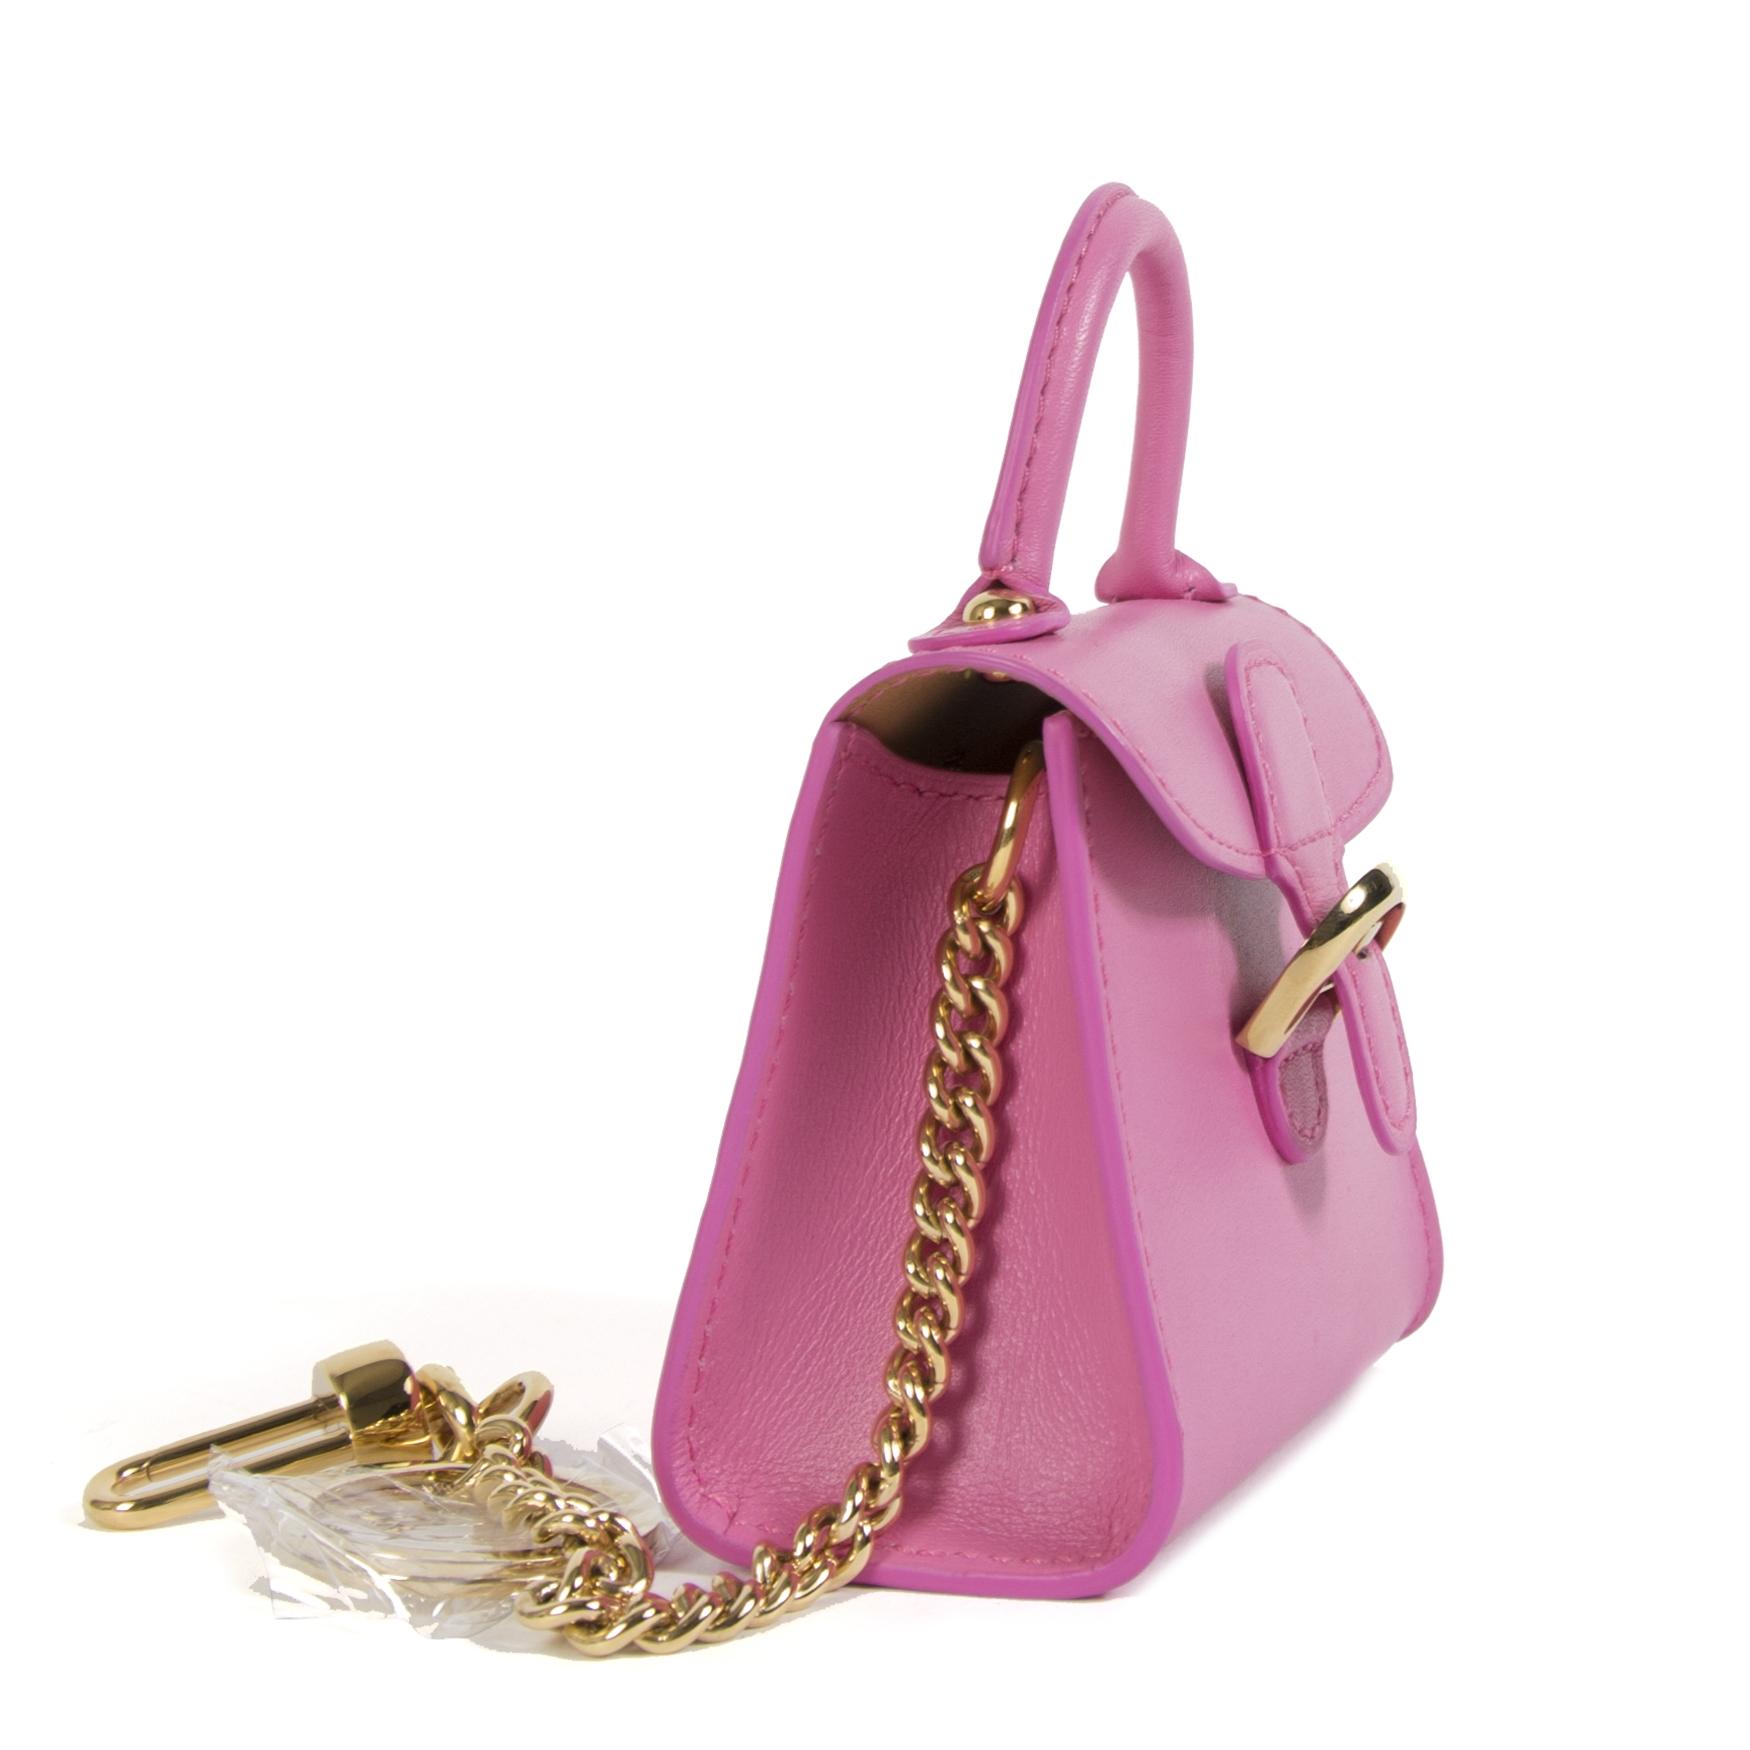 Authentieke tweedehands vintage Delvaux Brillant Charm Pink koop online webshop LabelLOV